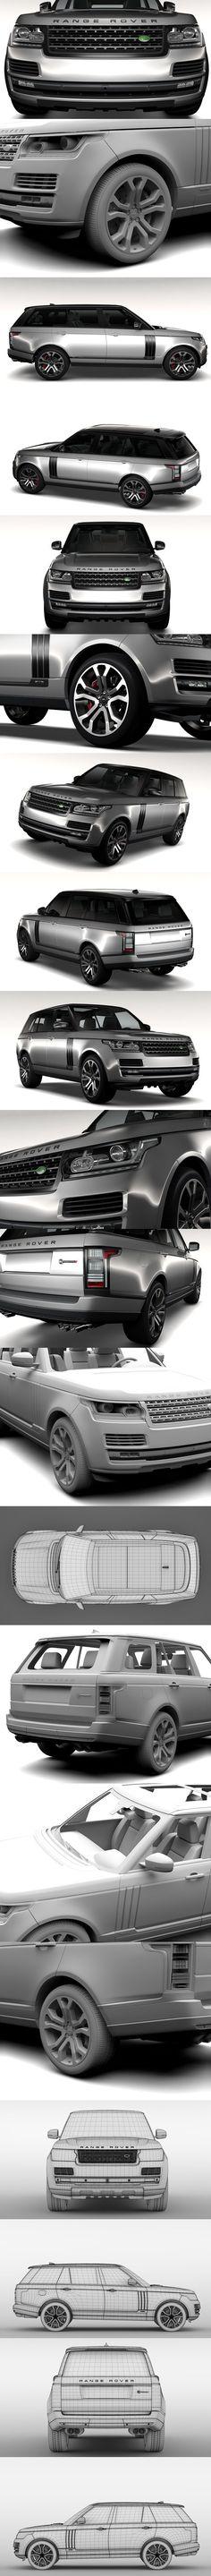 Range Rover SVAutobiography Dynamic. 3D Vehicles